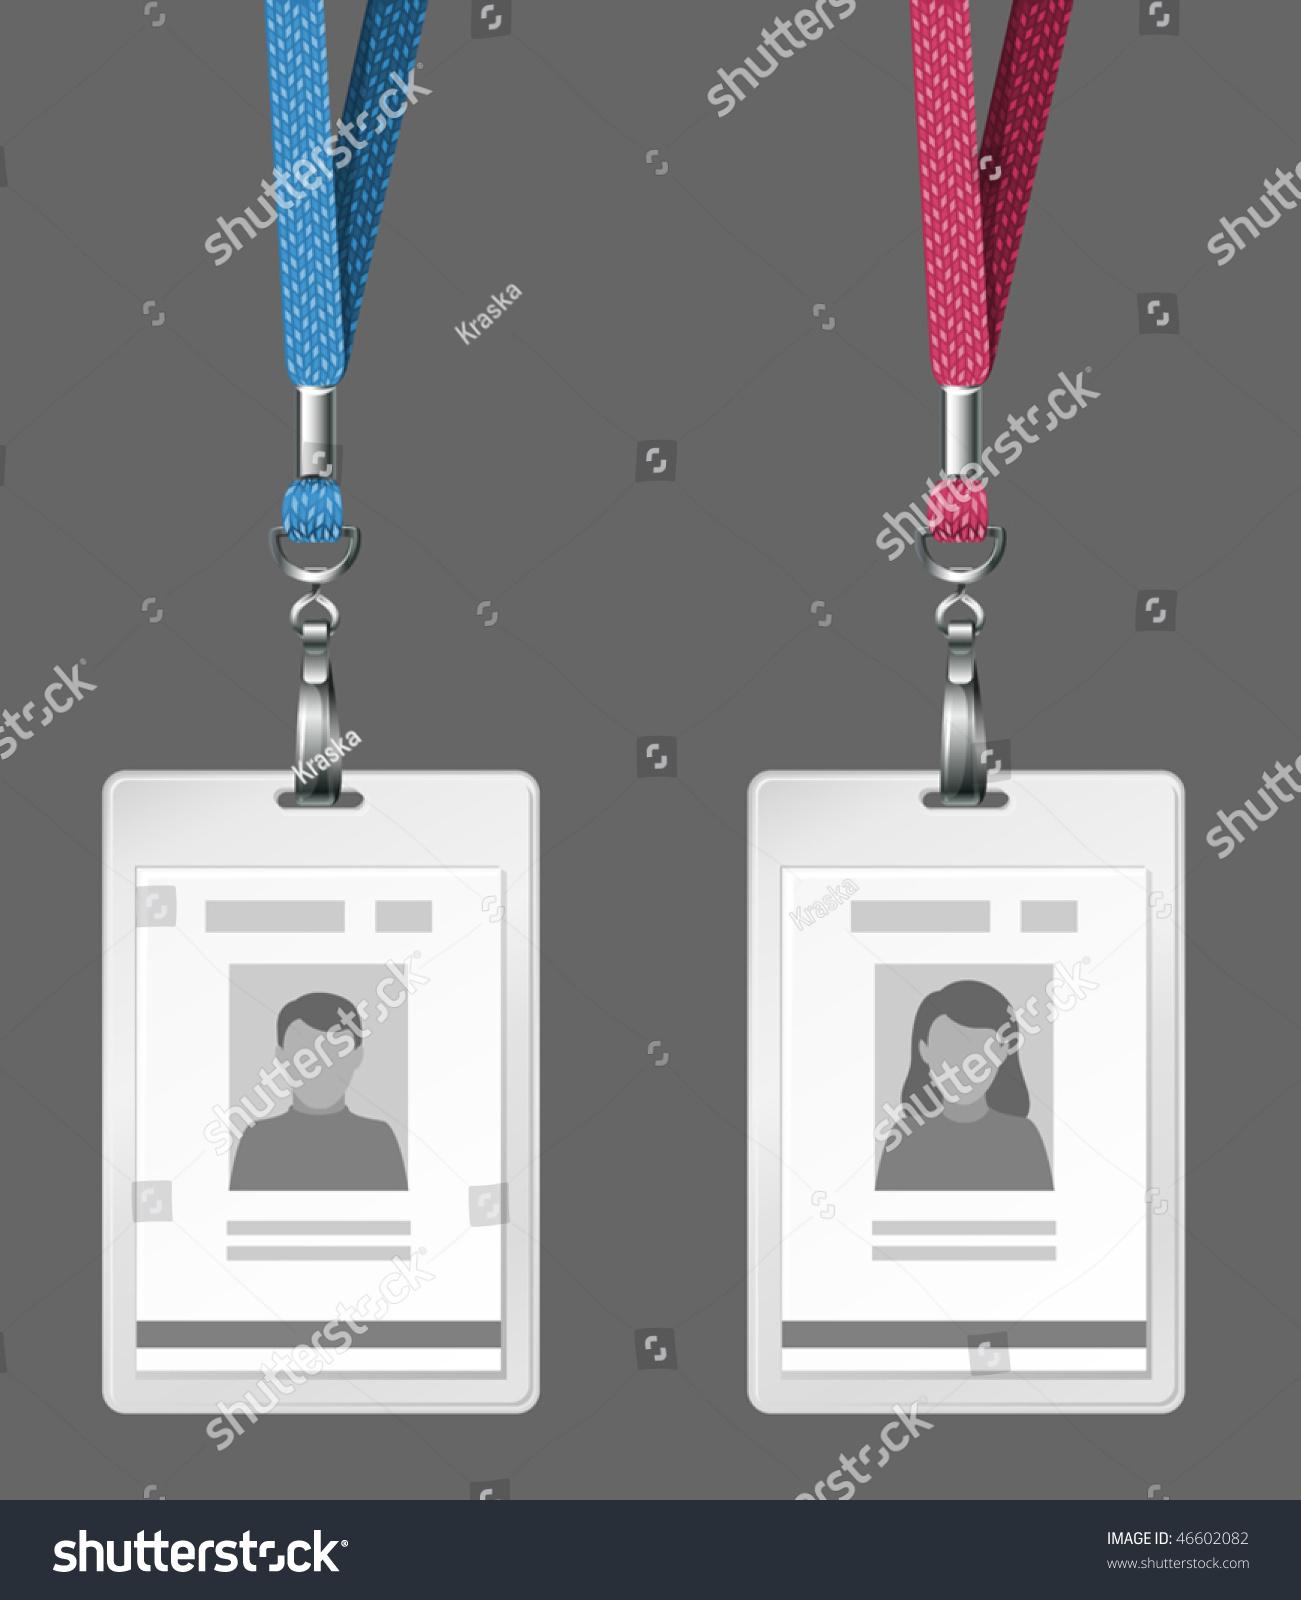 id badge template - shefftunes.tk